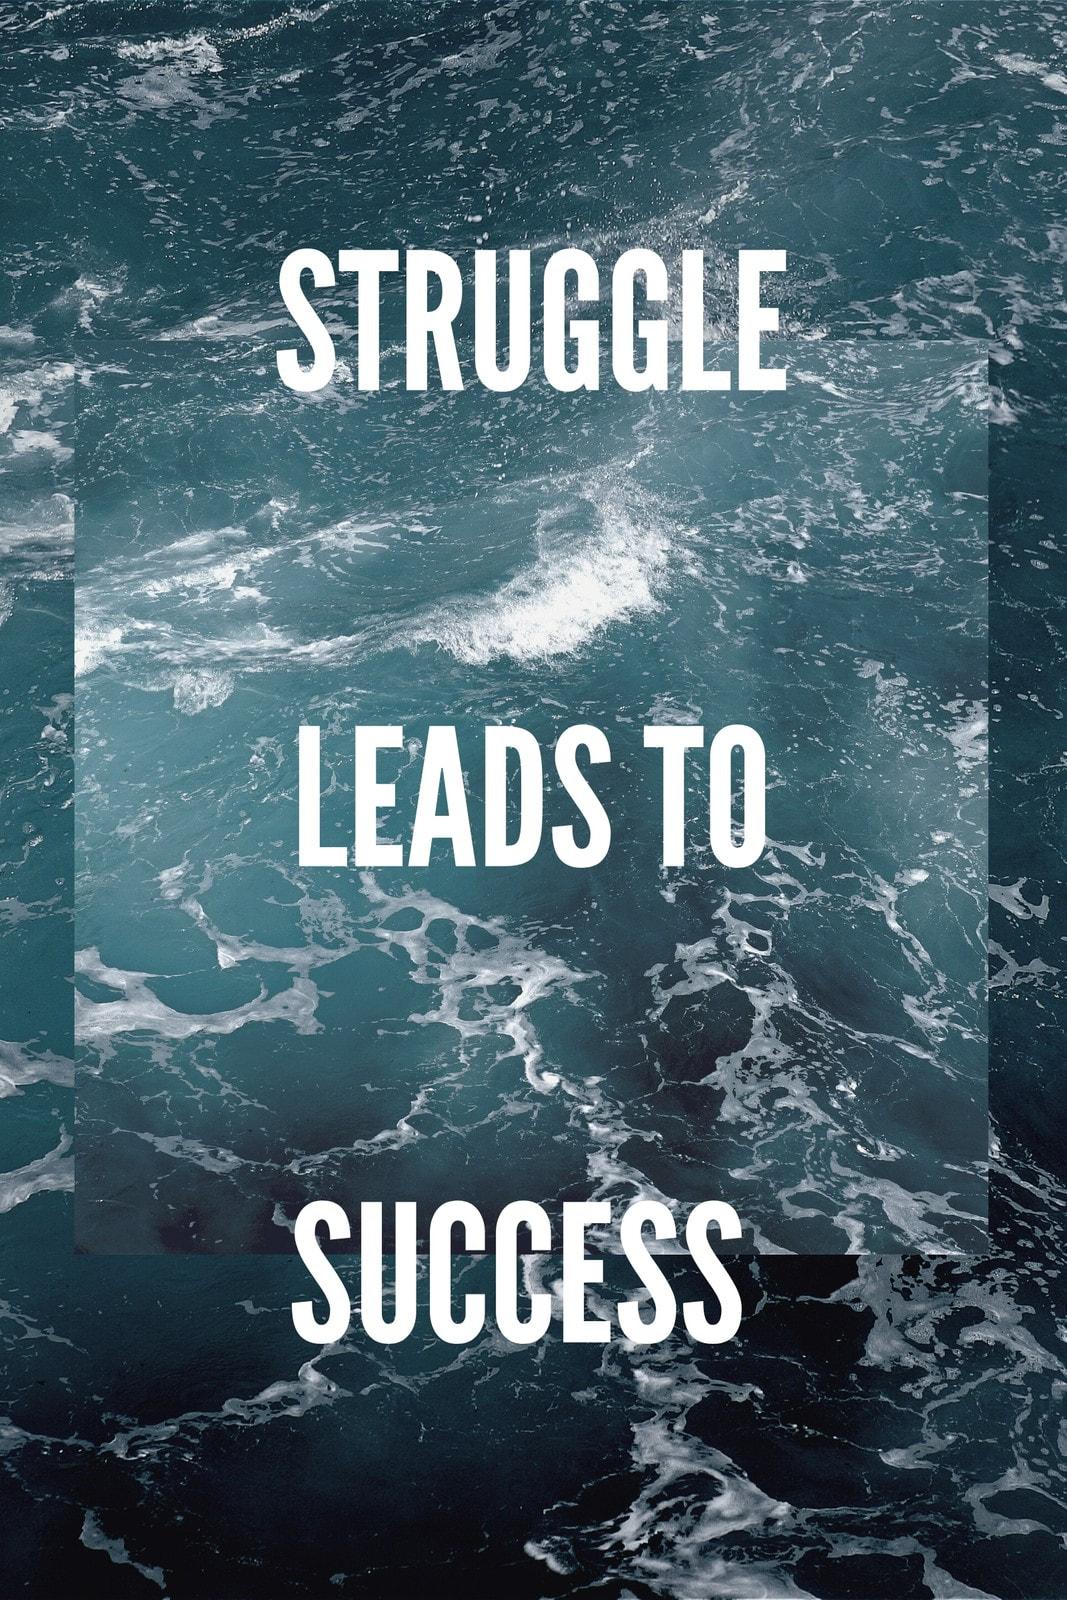 Ocean Waves Tumblr Graphic